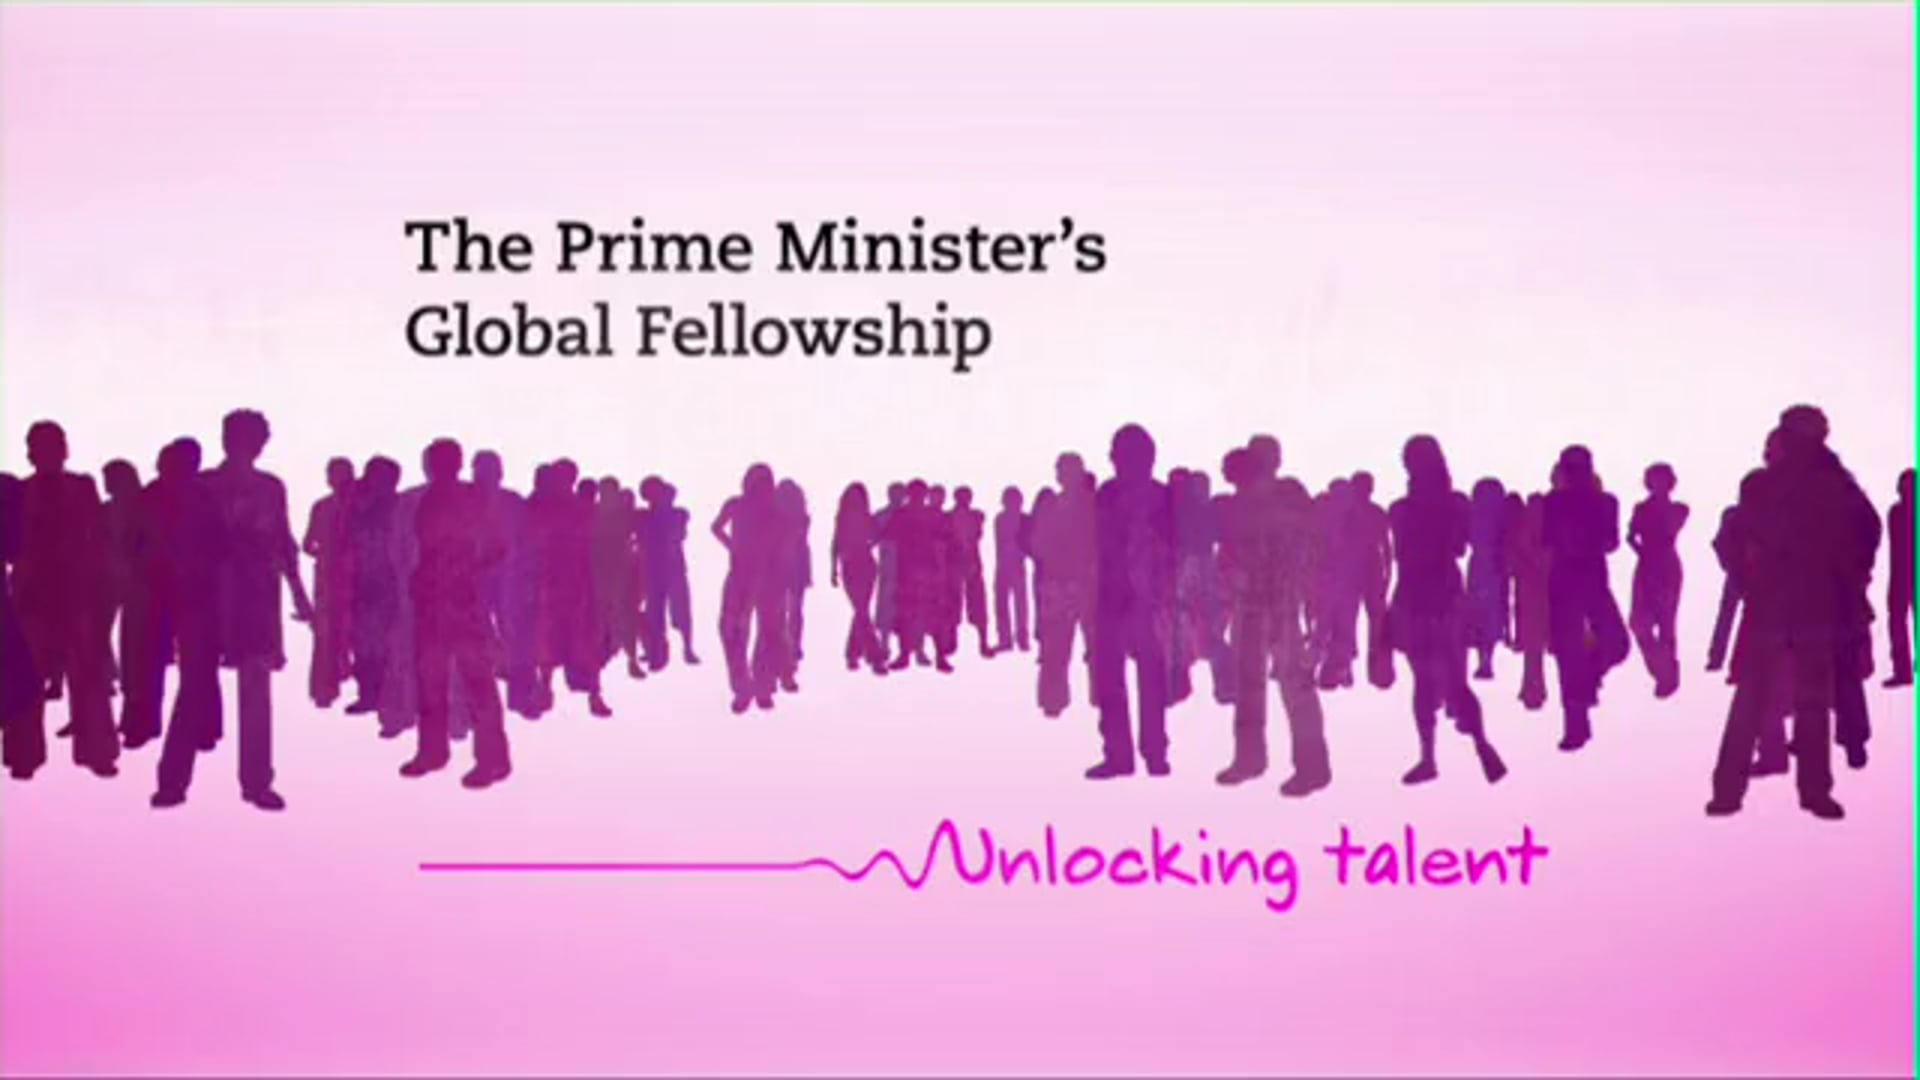 The Prime Minister's Global Fellowship